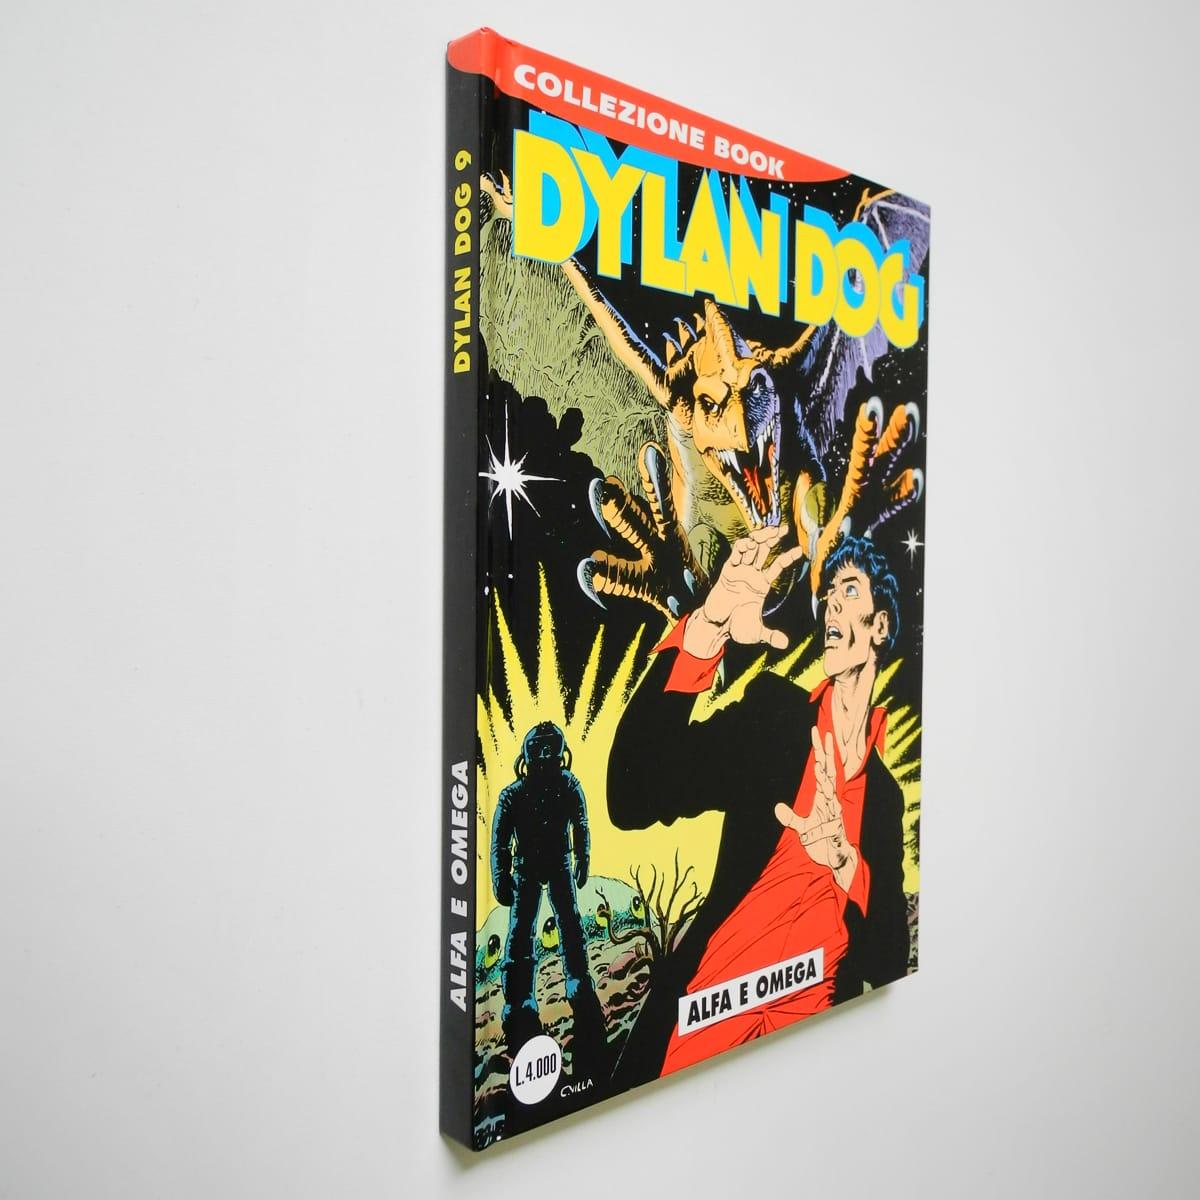 Dylan Dog Collezione Book n. 9 Bonelli